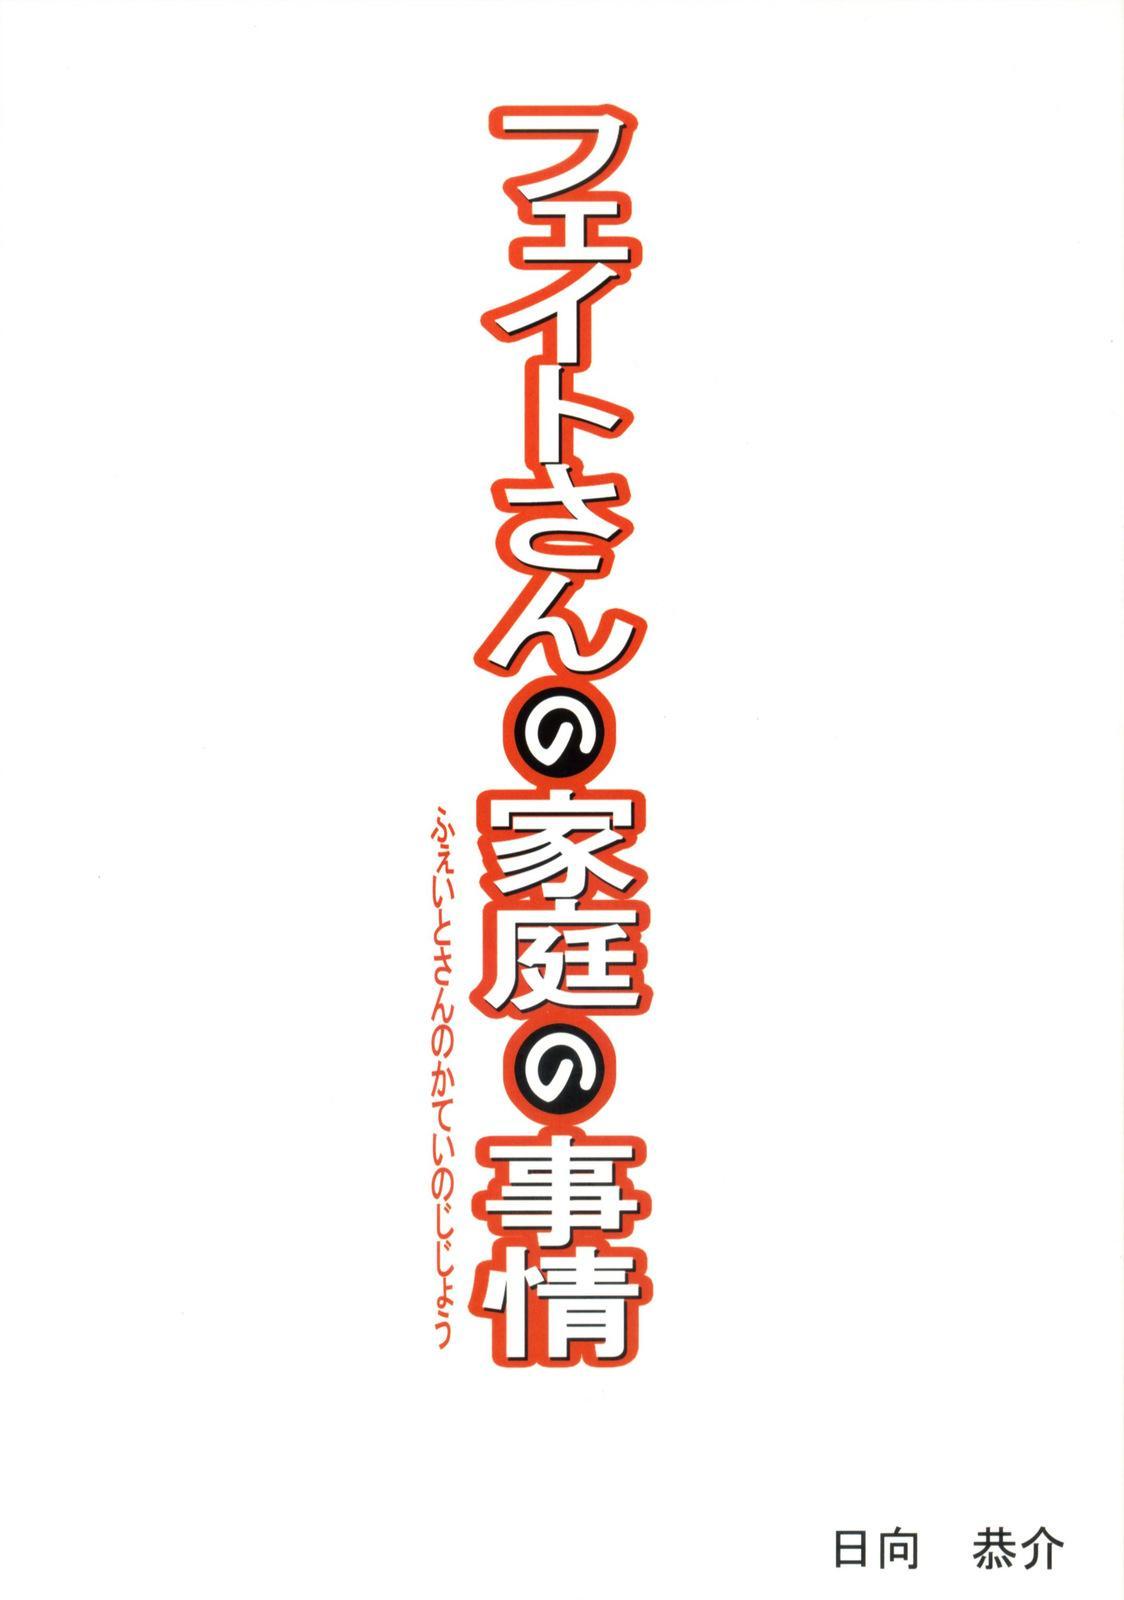 (COMIC1) [STUDIO HIMAWARI (Himukai Kyousuke)] Fate-san no Katei no Jijou | Fate-san's Family Circumstances (Mahou Shoujo Lyrical Nanoha) [English] [lightshader] 1